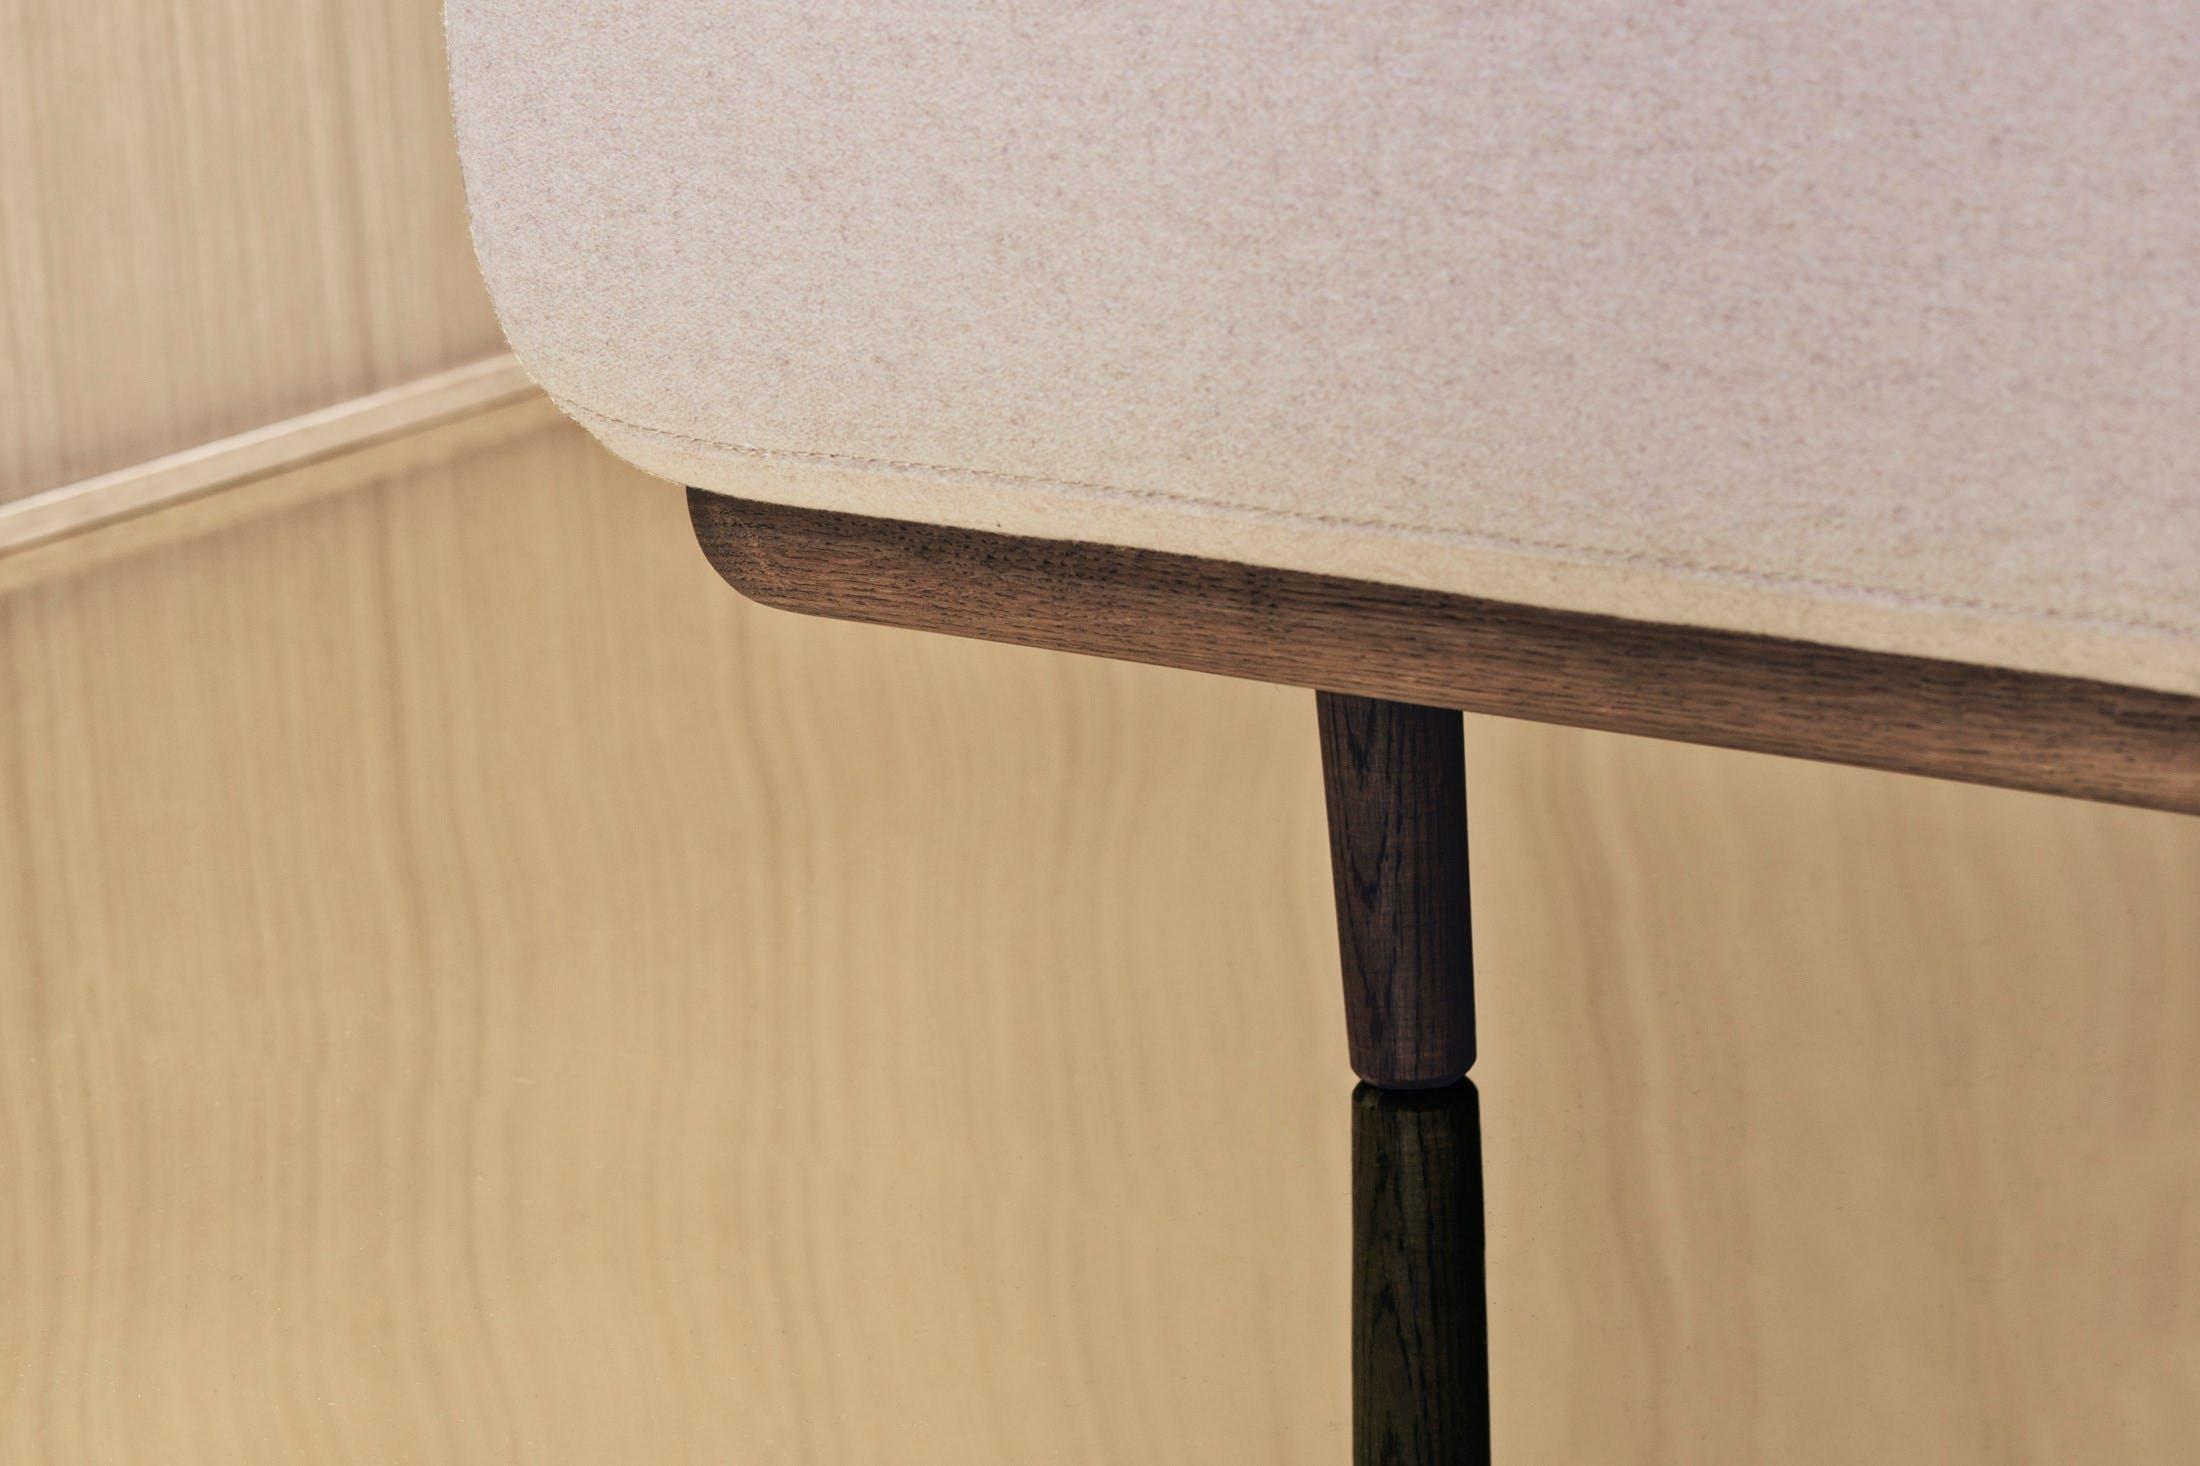 Bolia Madison Sofa Leg Detail Insitu Haute Living